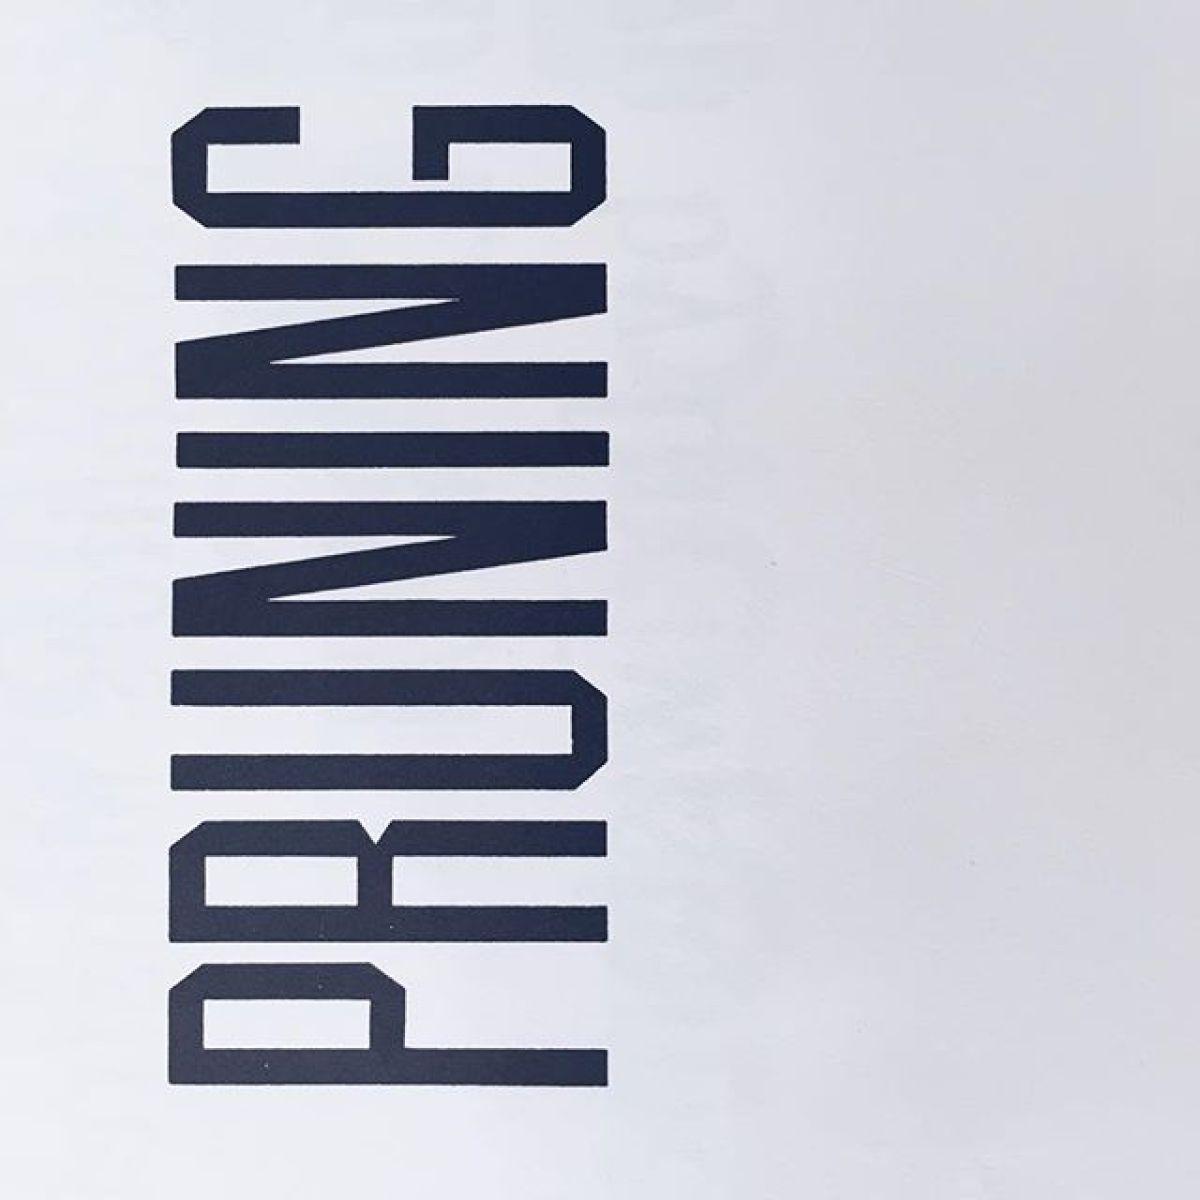 Work In Progress — Colour and Type.Branding.#graphics #design #agencylife #graphicdesigner #graphicdesign  #designer #graphicdesign #art #artdirection #grafik #Branding #brandingagency #Brand #colour #paper #blue #pink #print #typography #type #typeface #typespecimen #font #vintage #logo